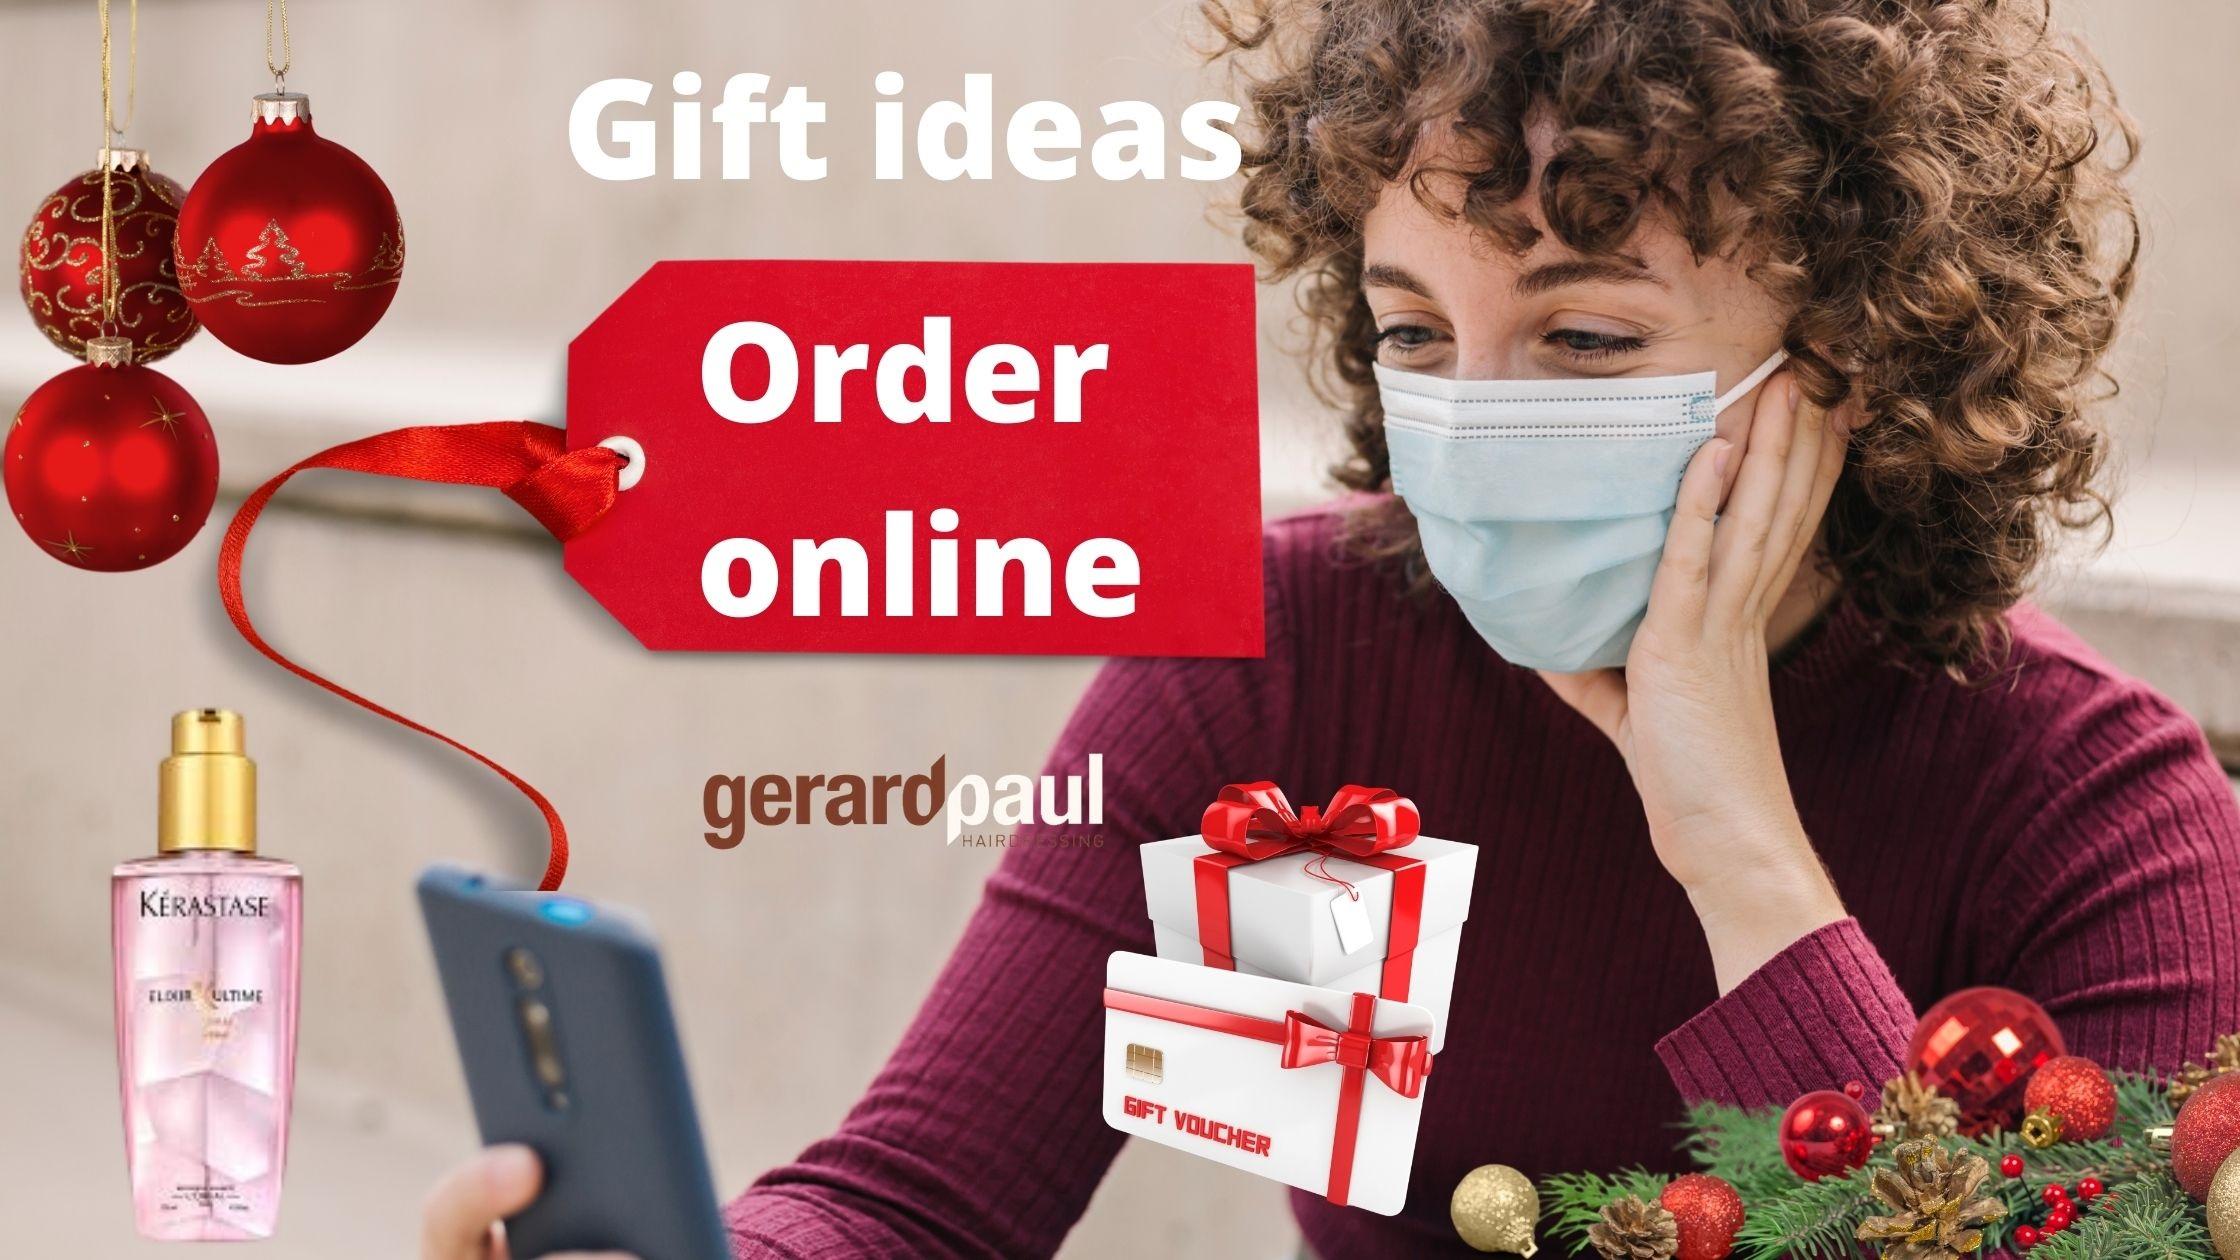 Gerard Paul Hairdressers gift ideas